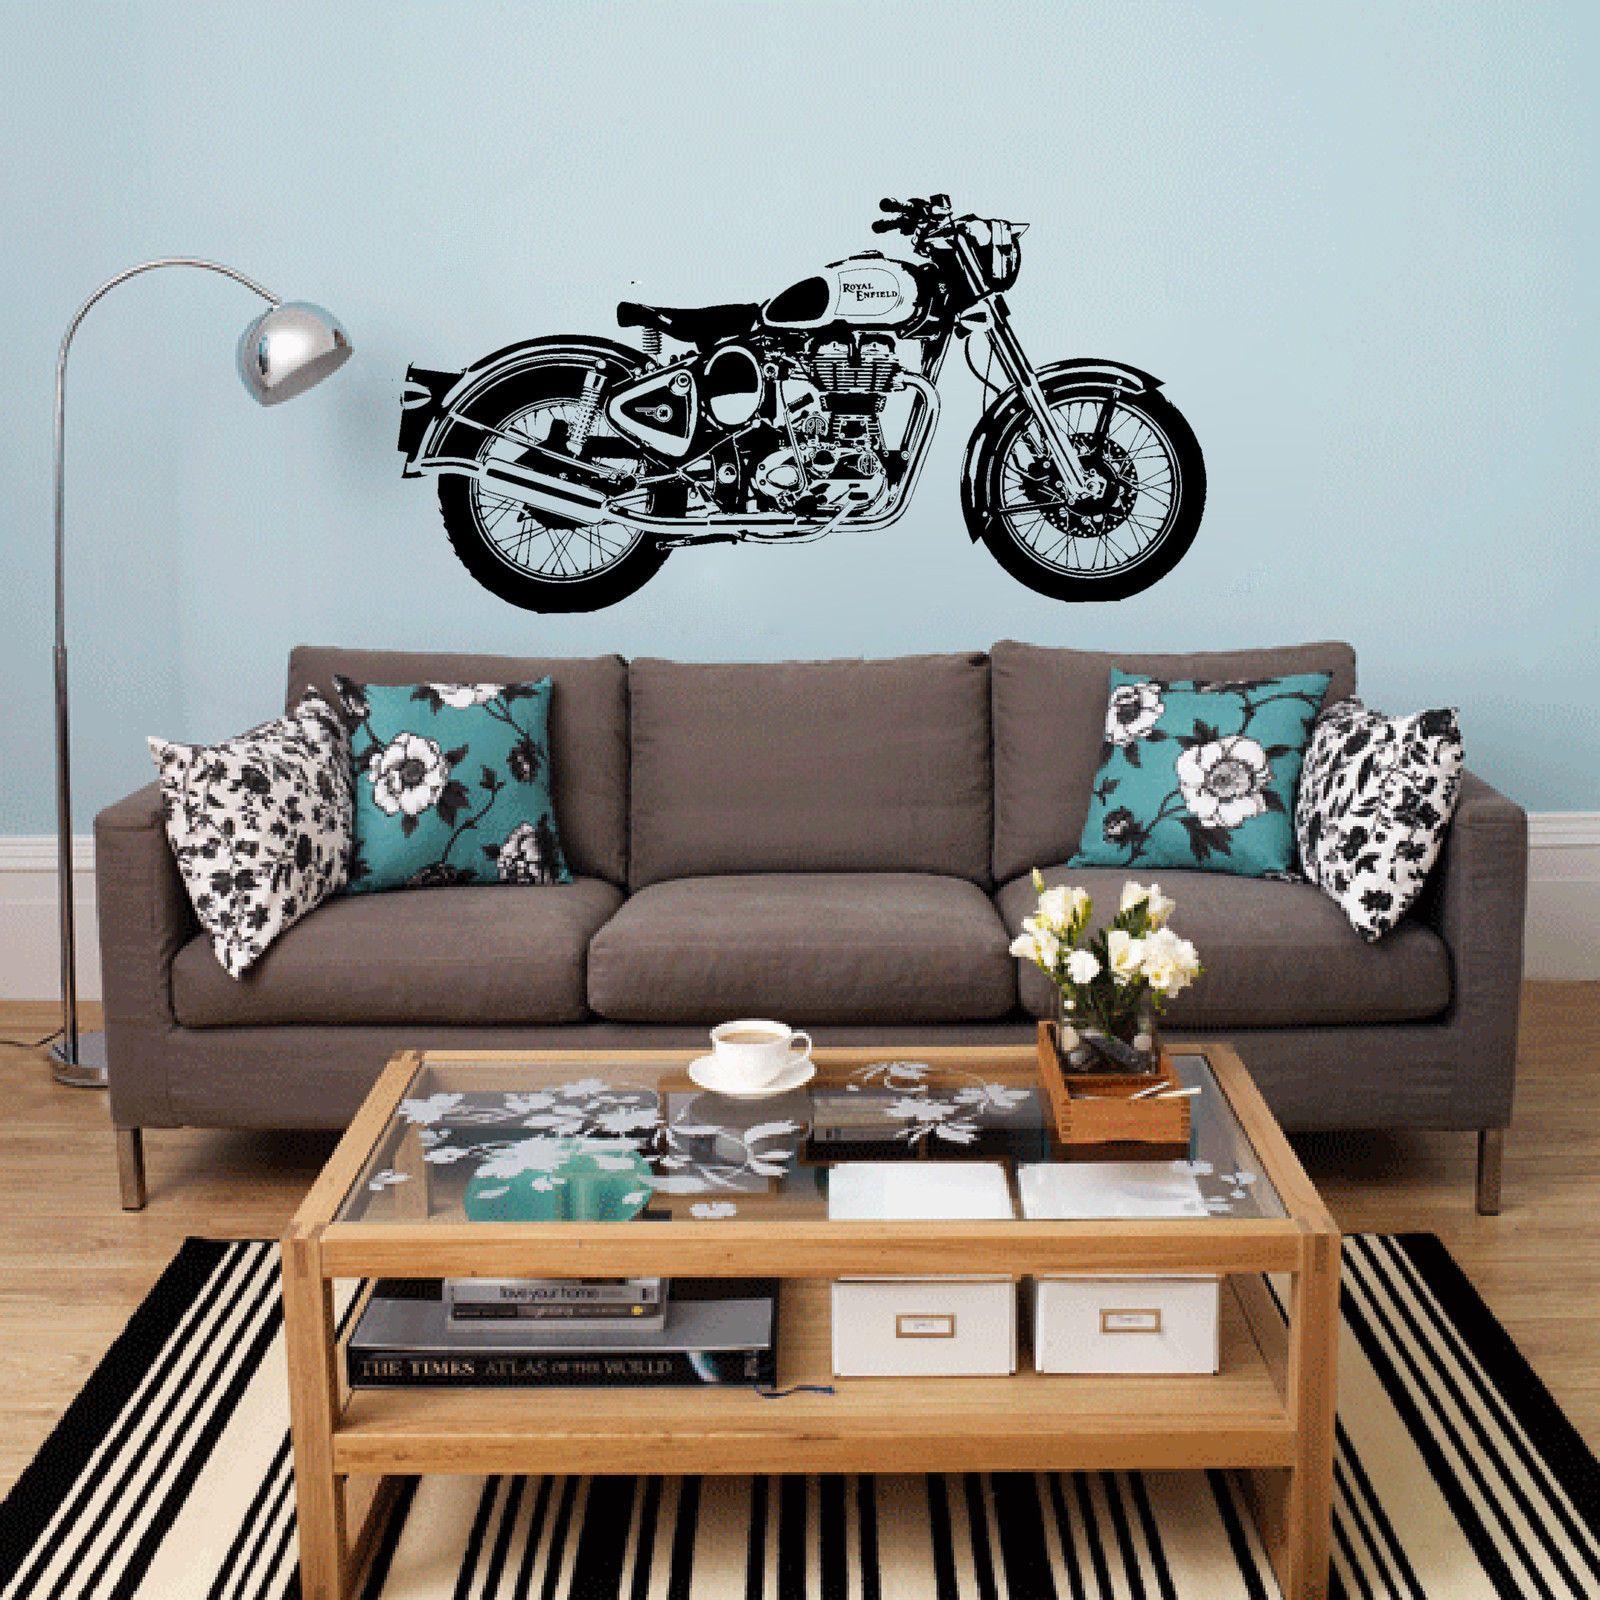 Buy D3681 Motorbike Wall Art Sticker Classic English Motorcycle